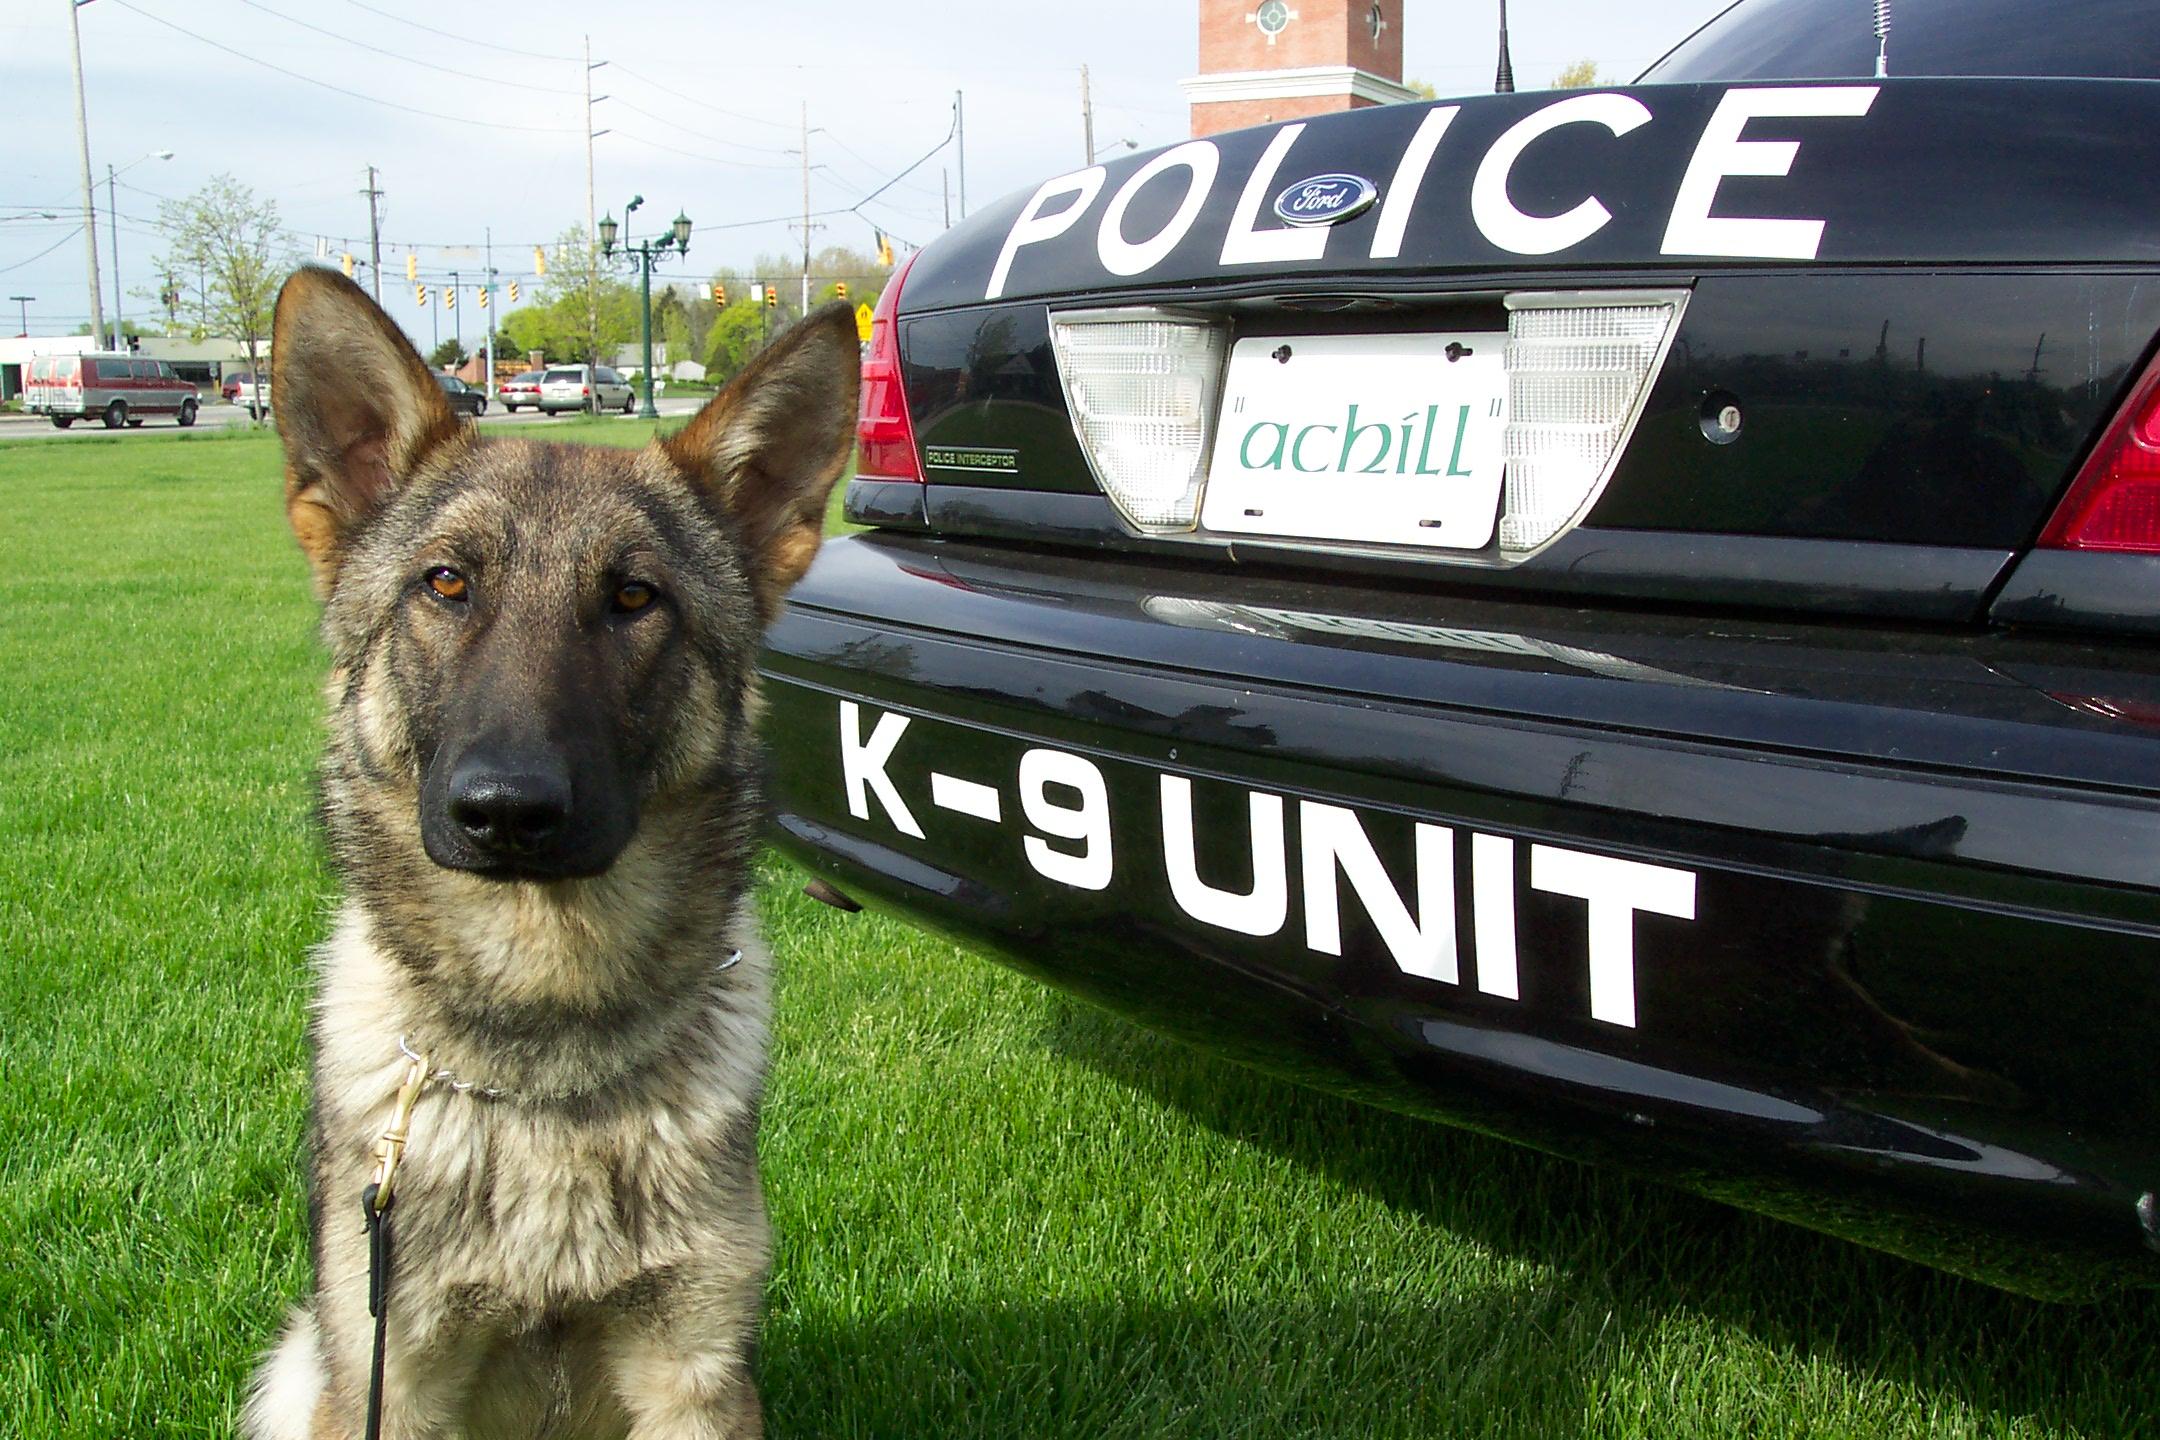 Photo: strongsville.com